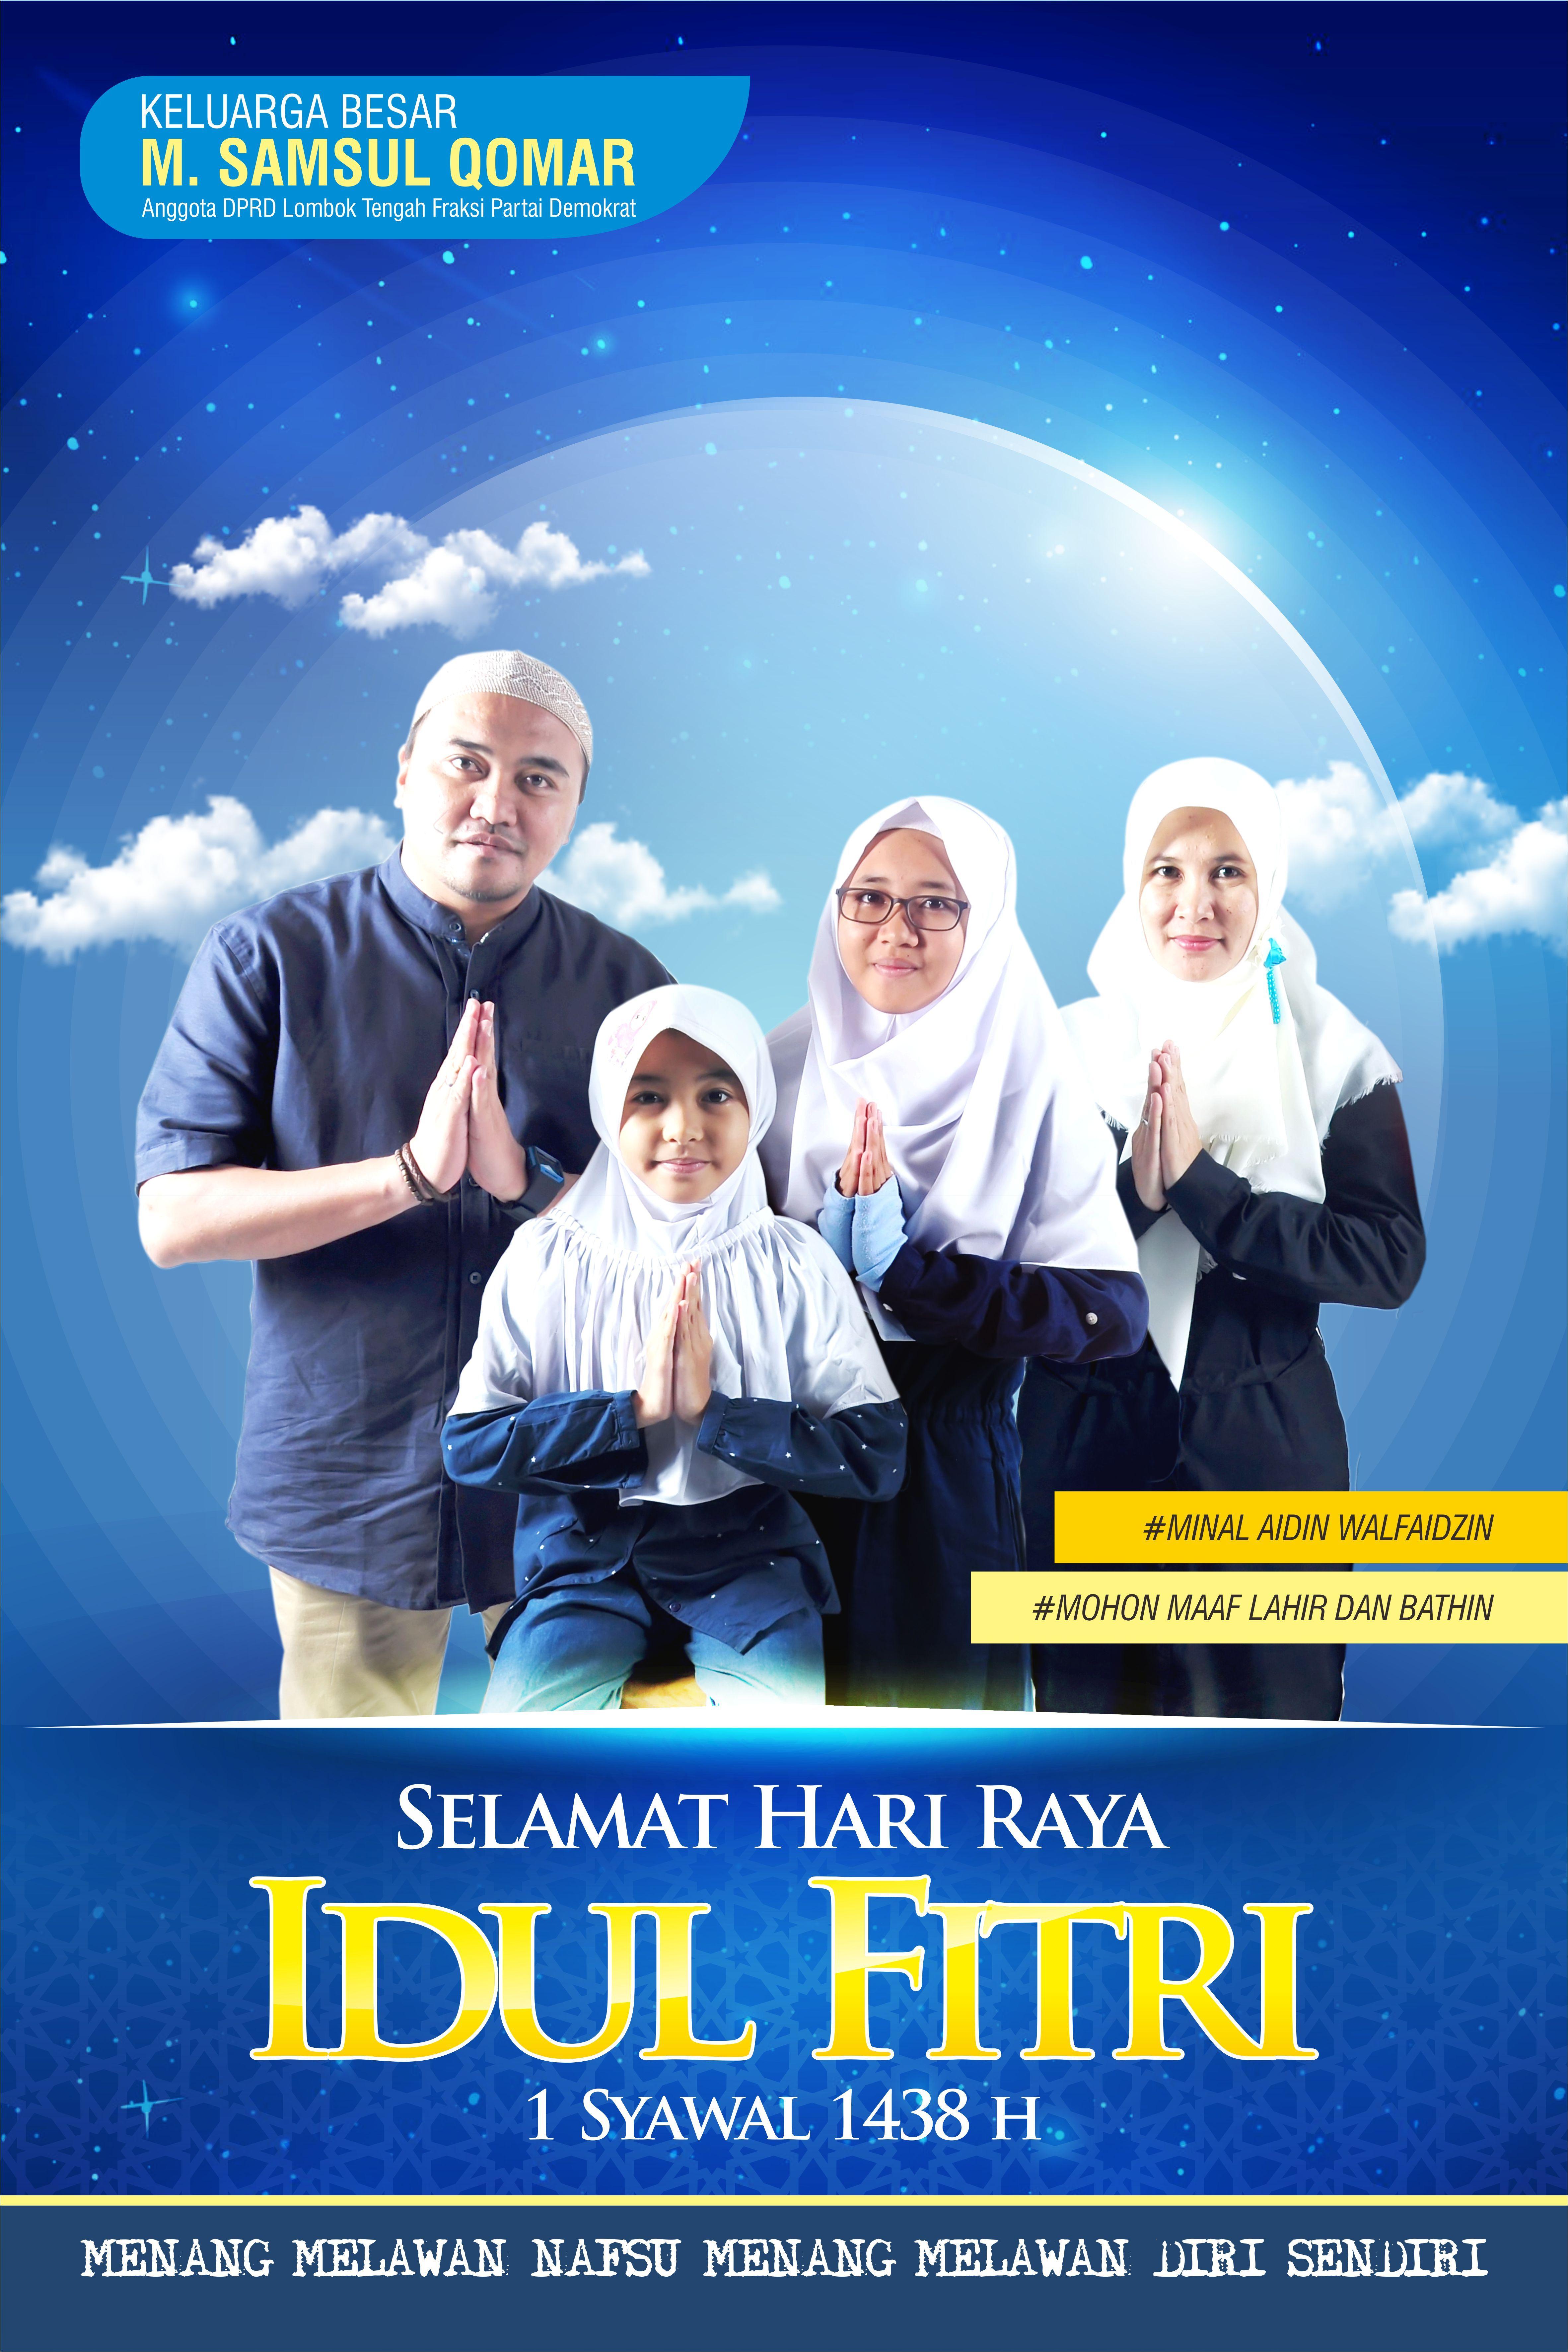 Banner Idul Fitri 2017 : banner, fitri, Poter, Fitri, Client, Samsul, Qomar, Spanduk,, Fitri,, Poster